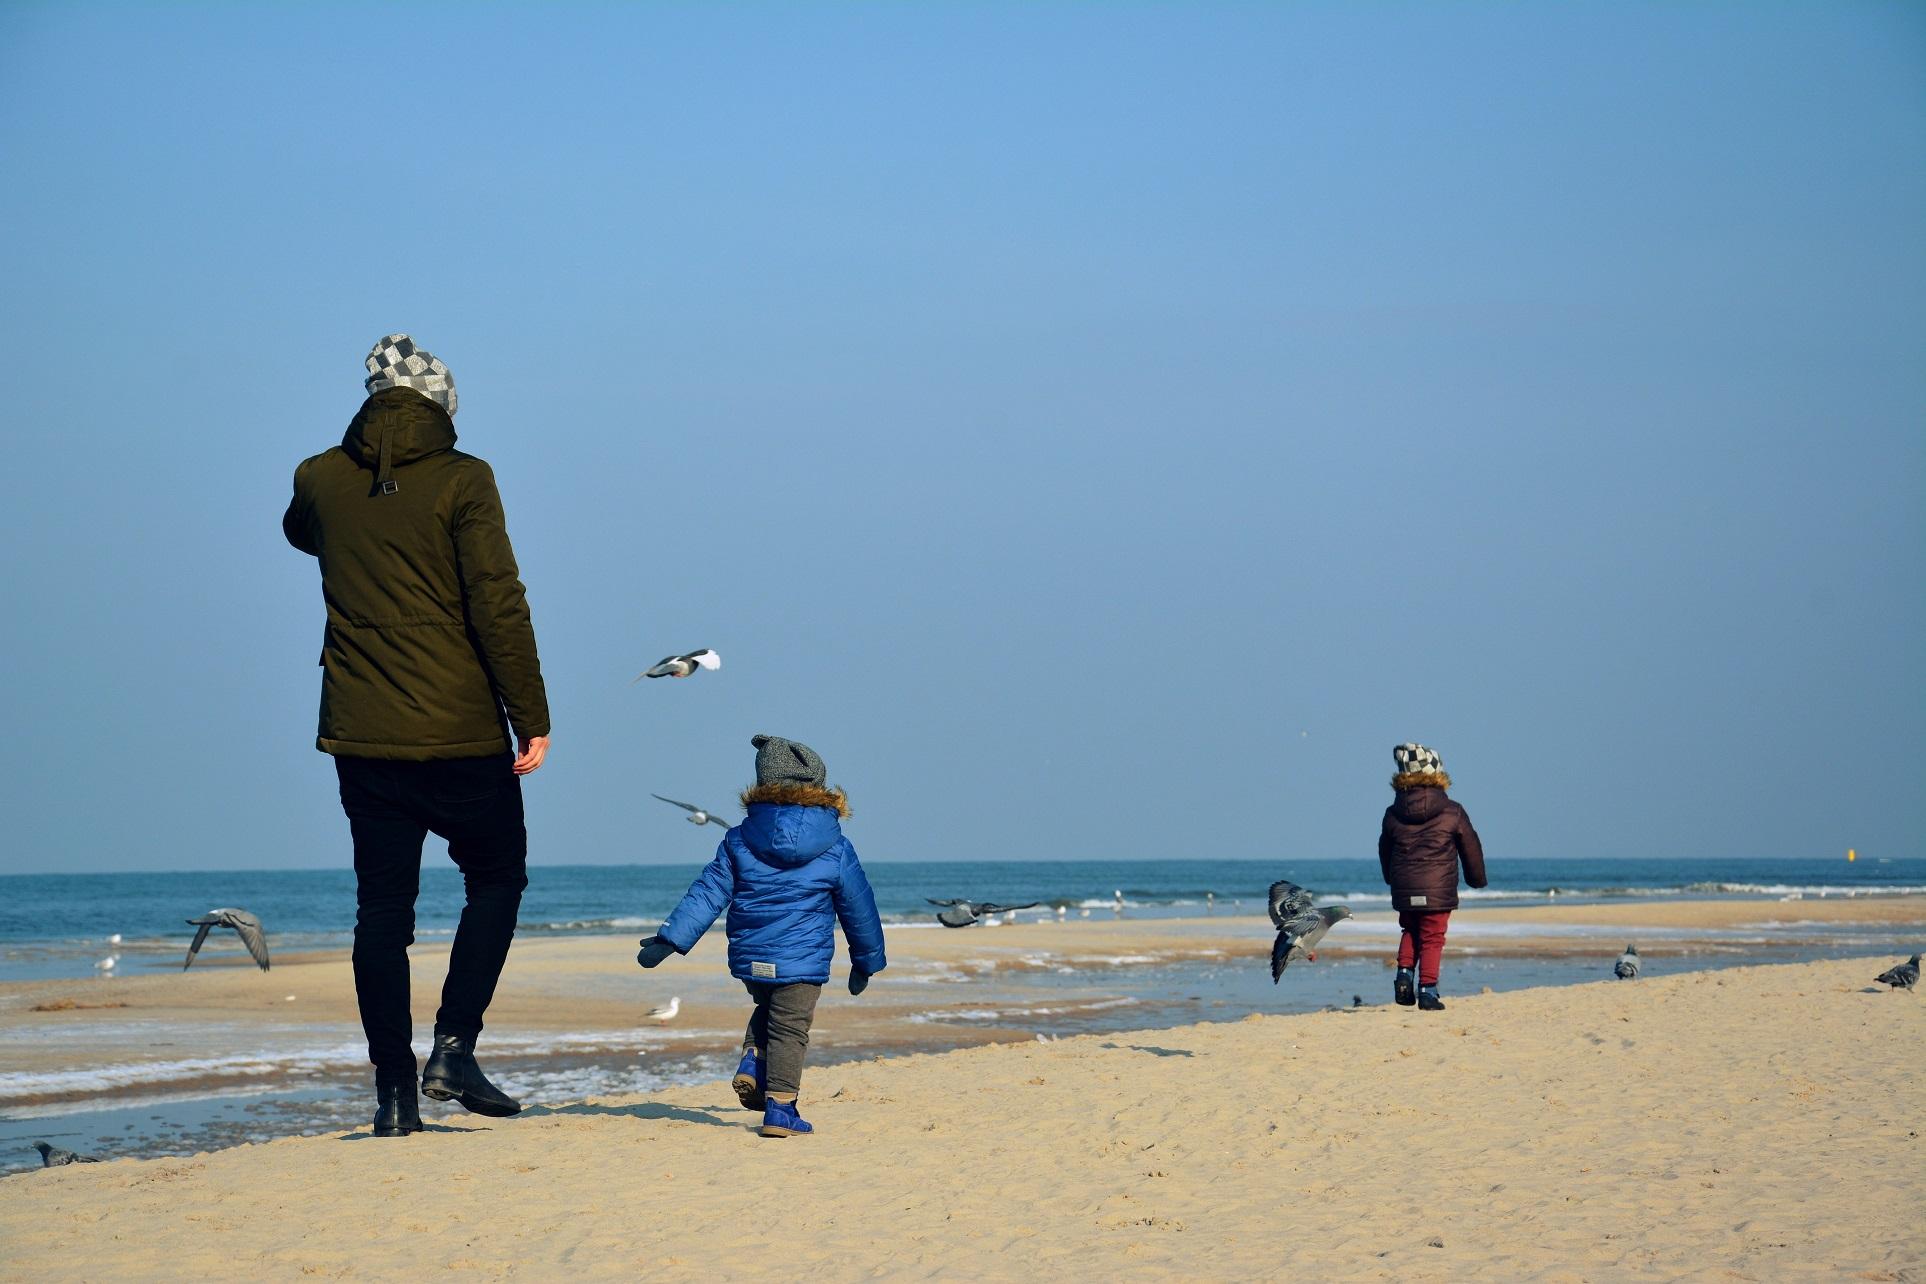 zima nad morze dzieci